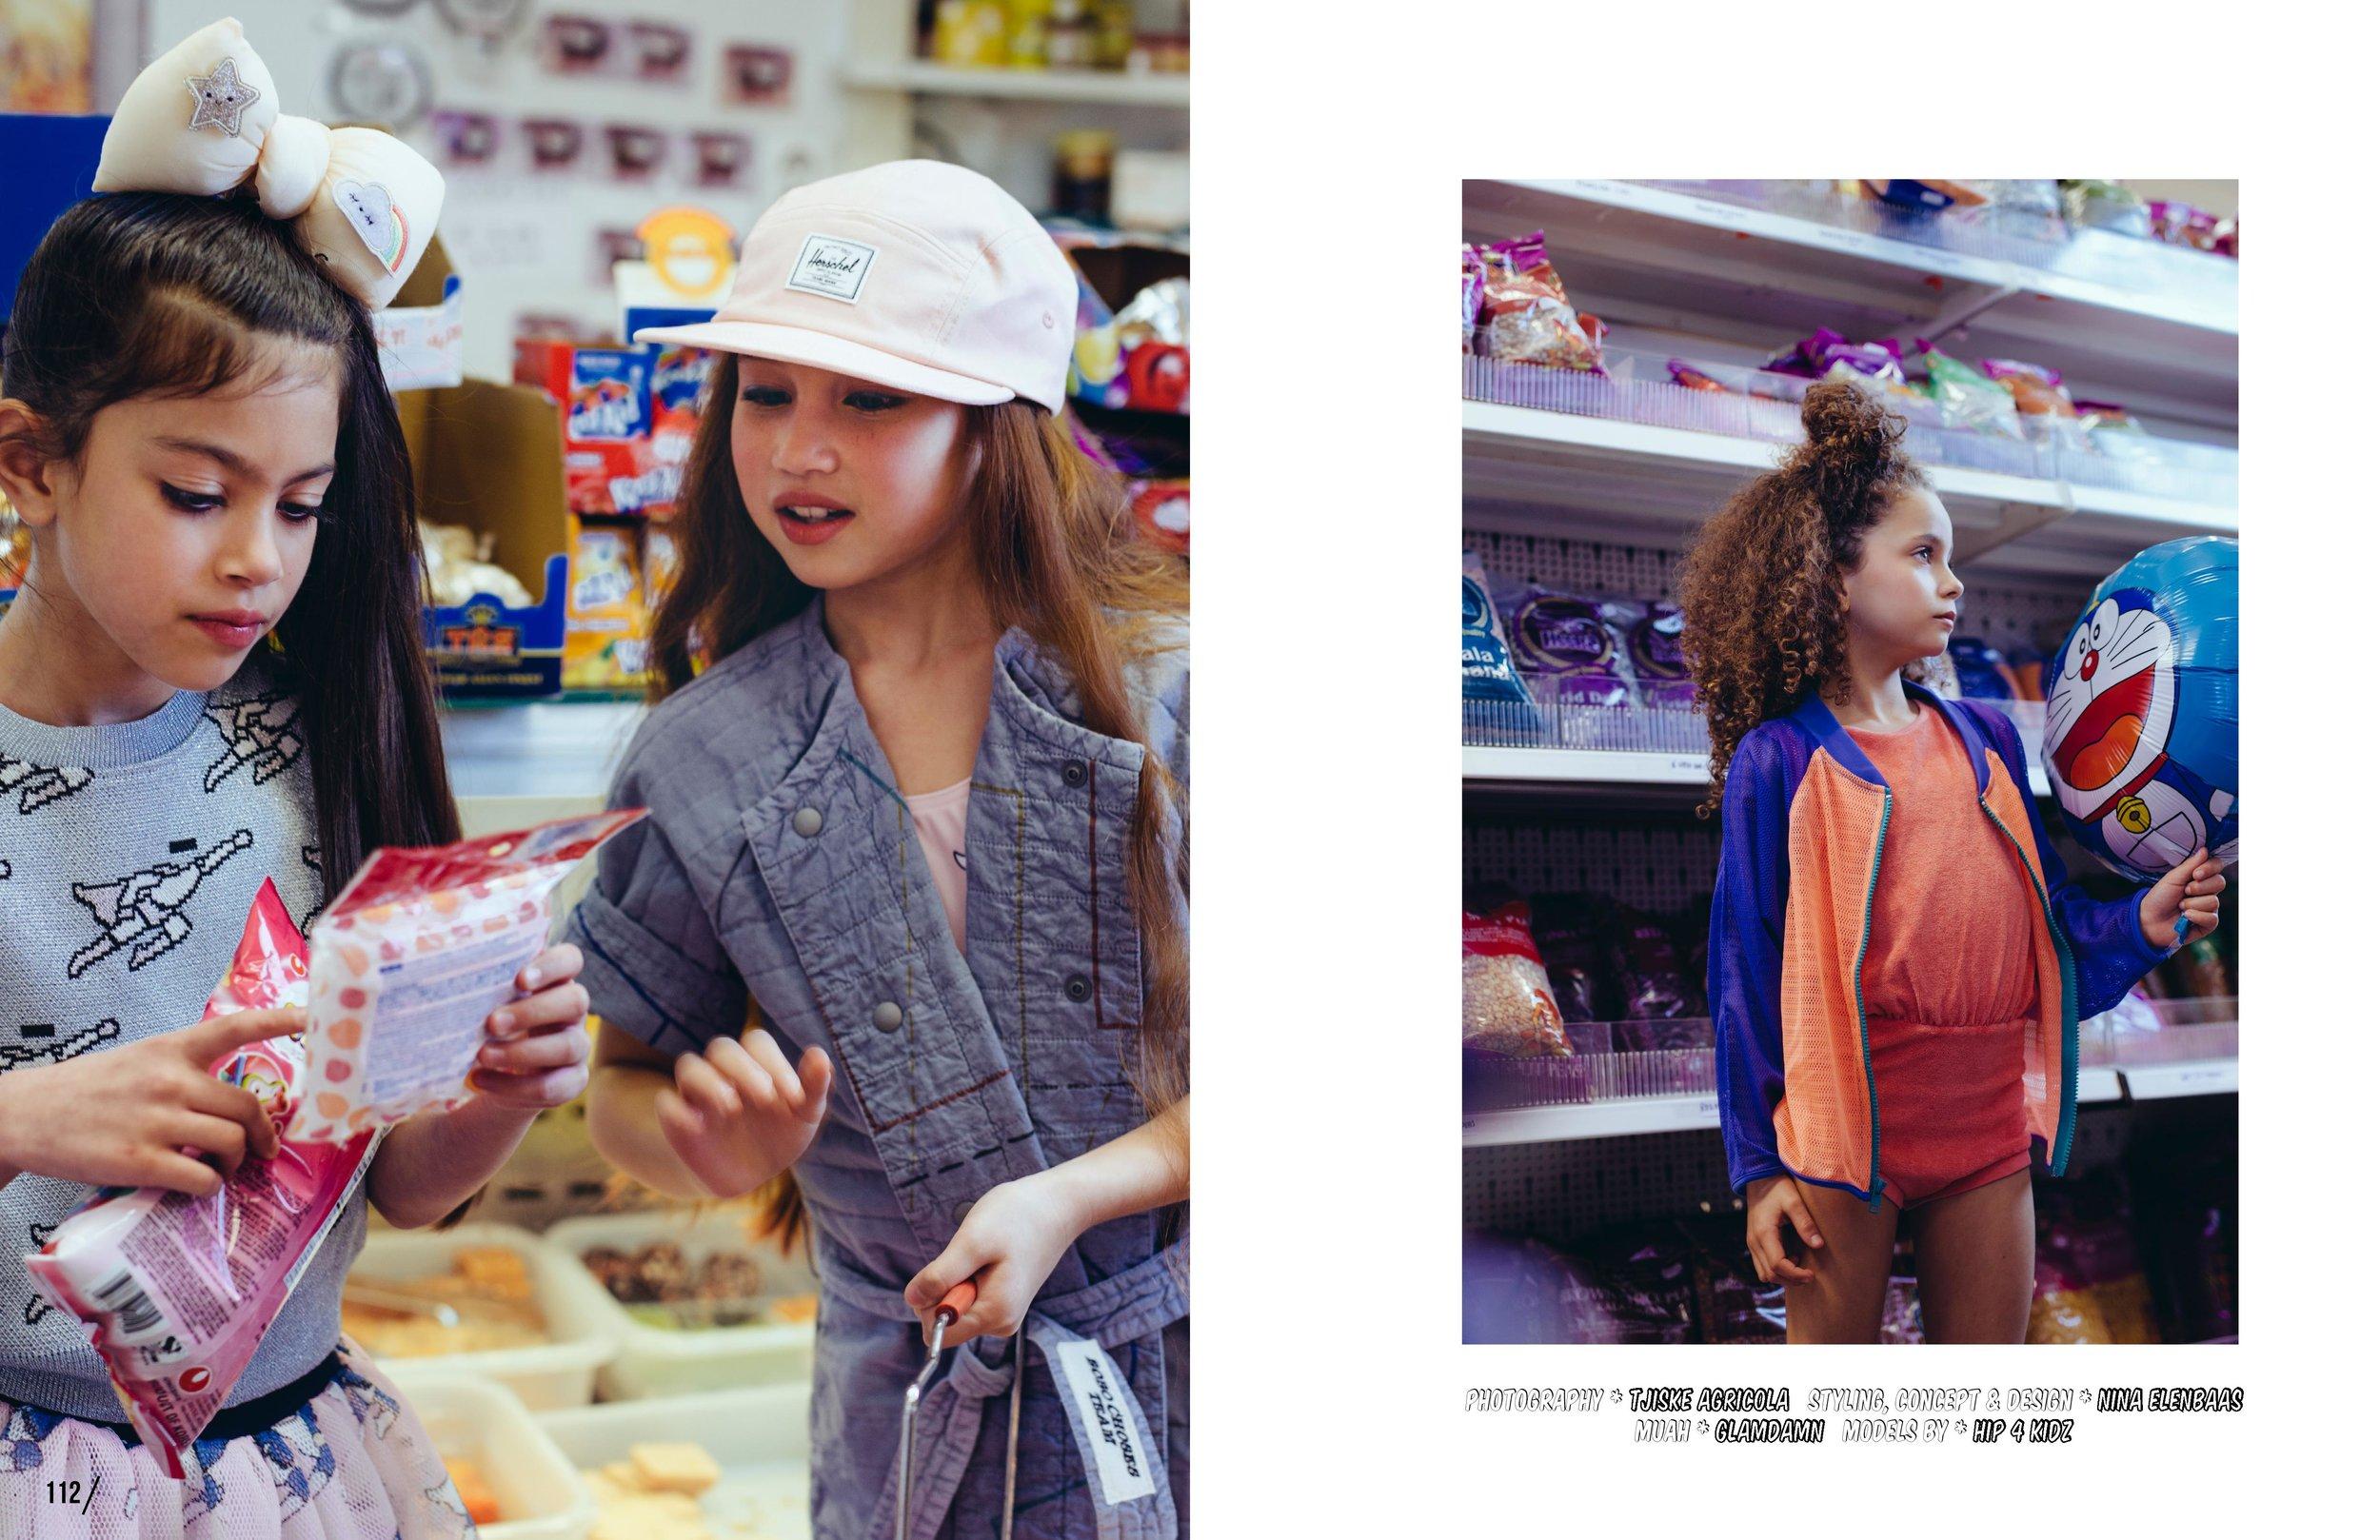 Summer2017-shoppingforlove-page-005.jpg